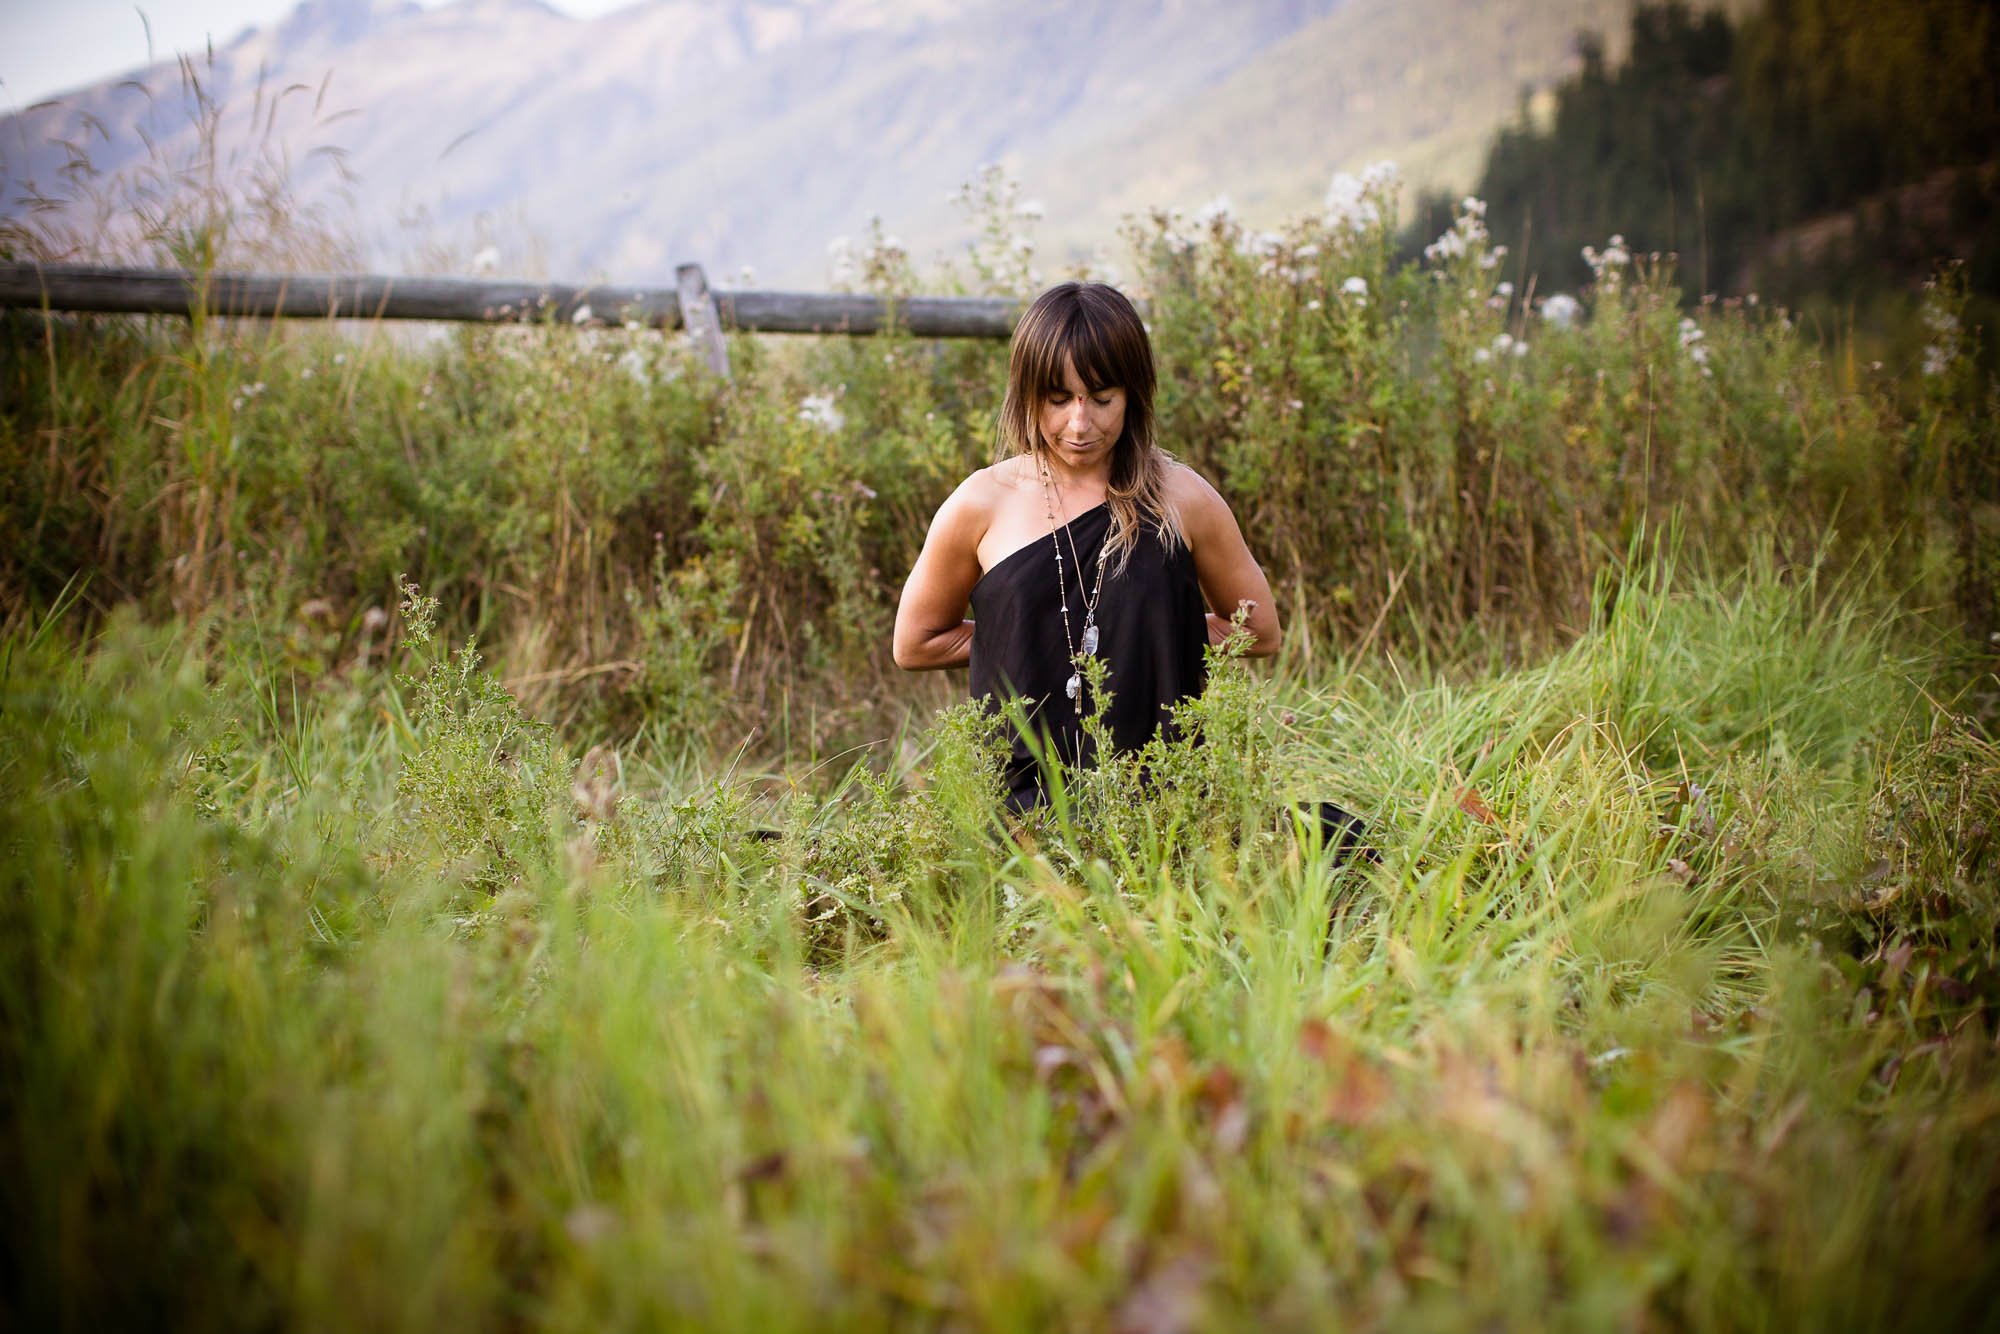 20140916_yoga_photography_commercial_fitness_pemberton_1232.jpg